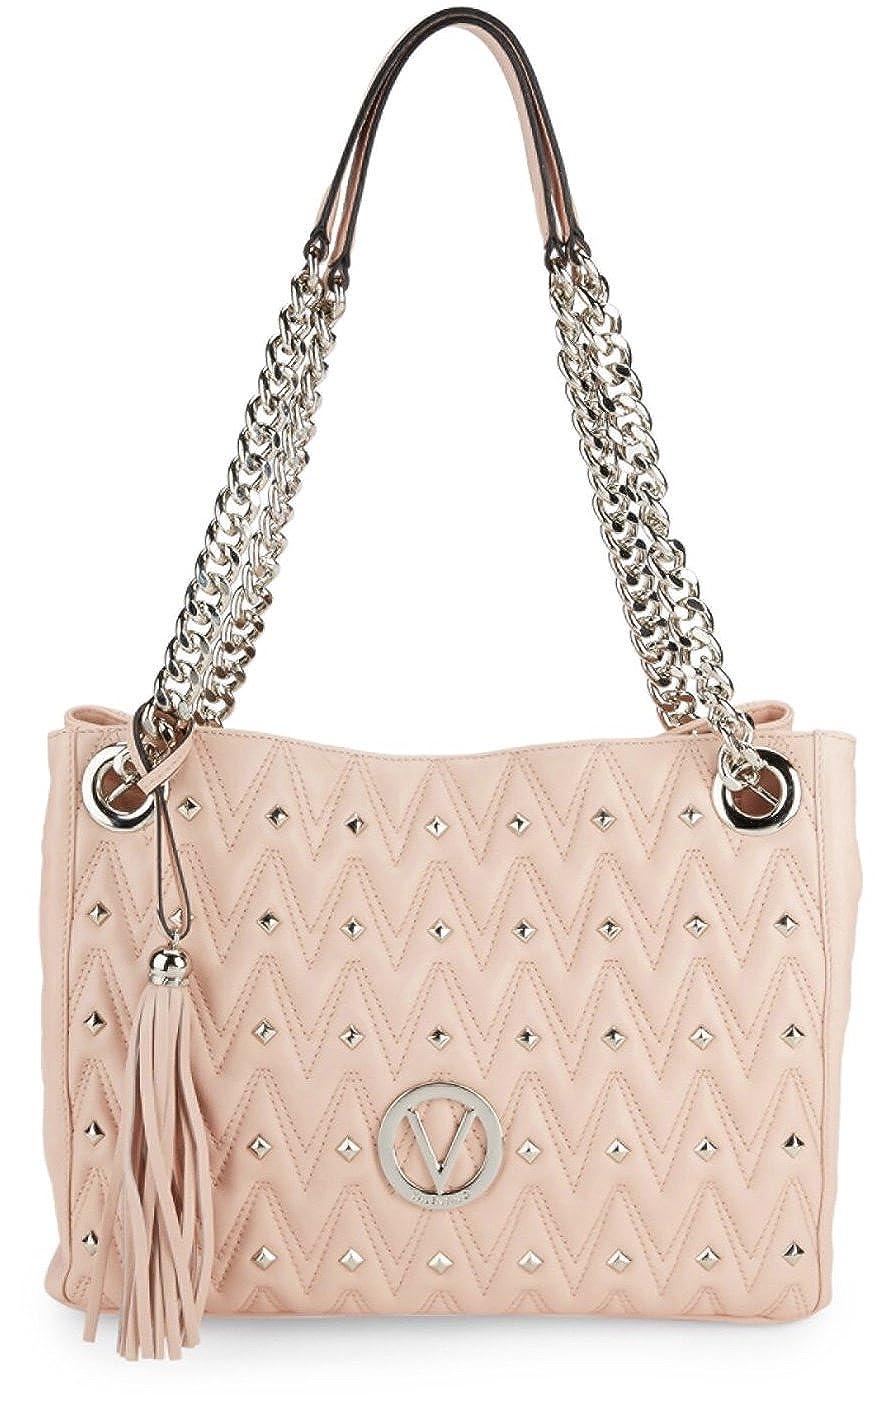 85275978979d Amazon.com  Valentino By Mario Valentino Luisa Diamond Quilted Leather  Shoulder Bag - Quartz  Shoes